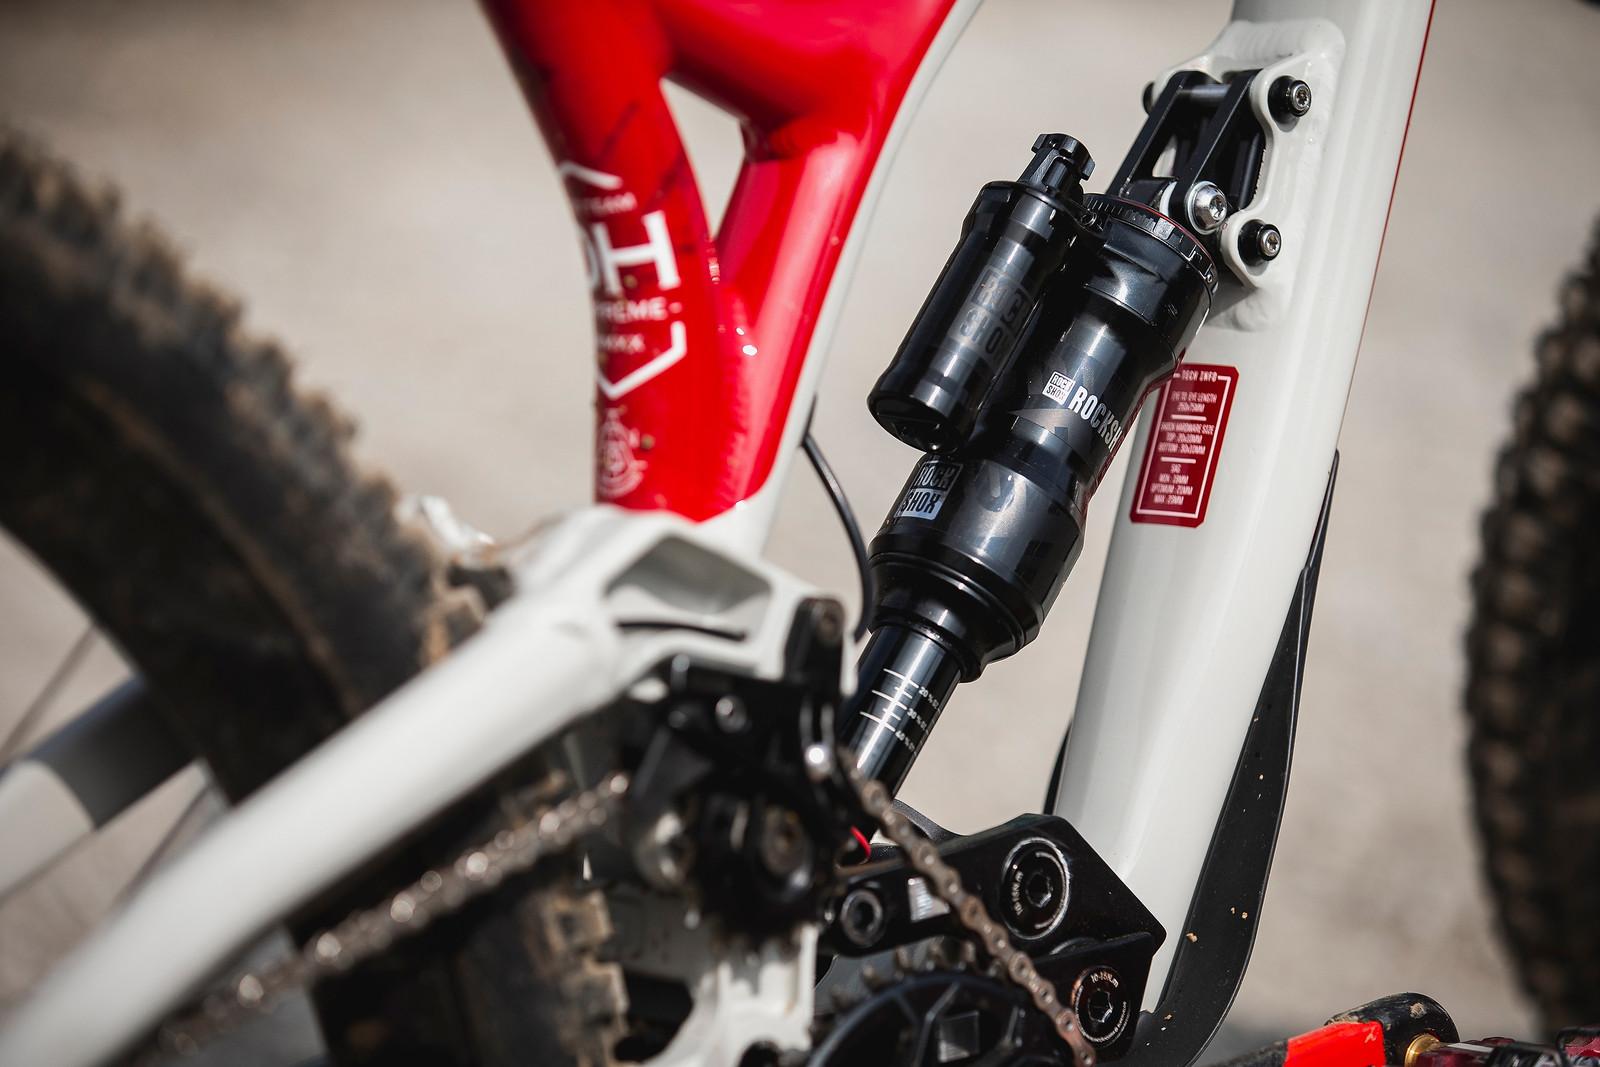 Back to Air Shock - WINNING BIKE - Amaury Pierron's Commencal Supreme DH - Mountain Biking Pictures - Vital MTB